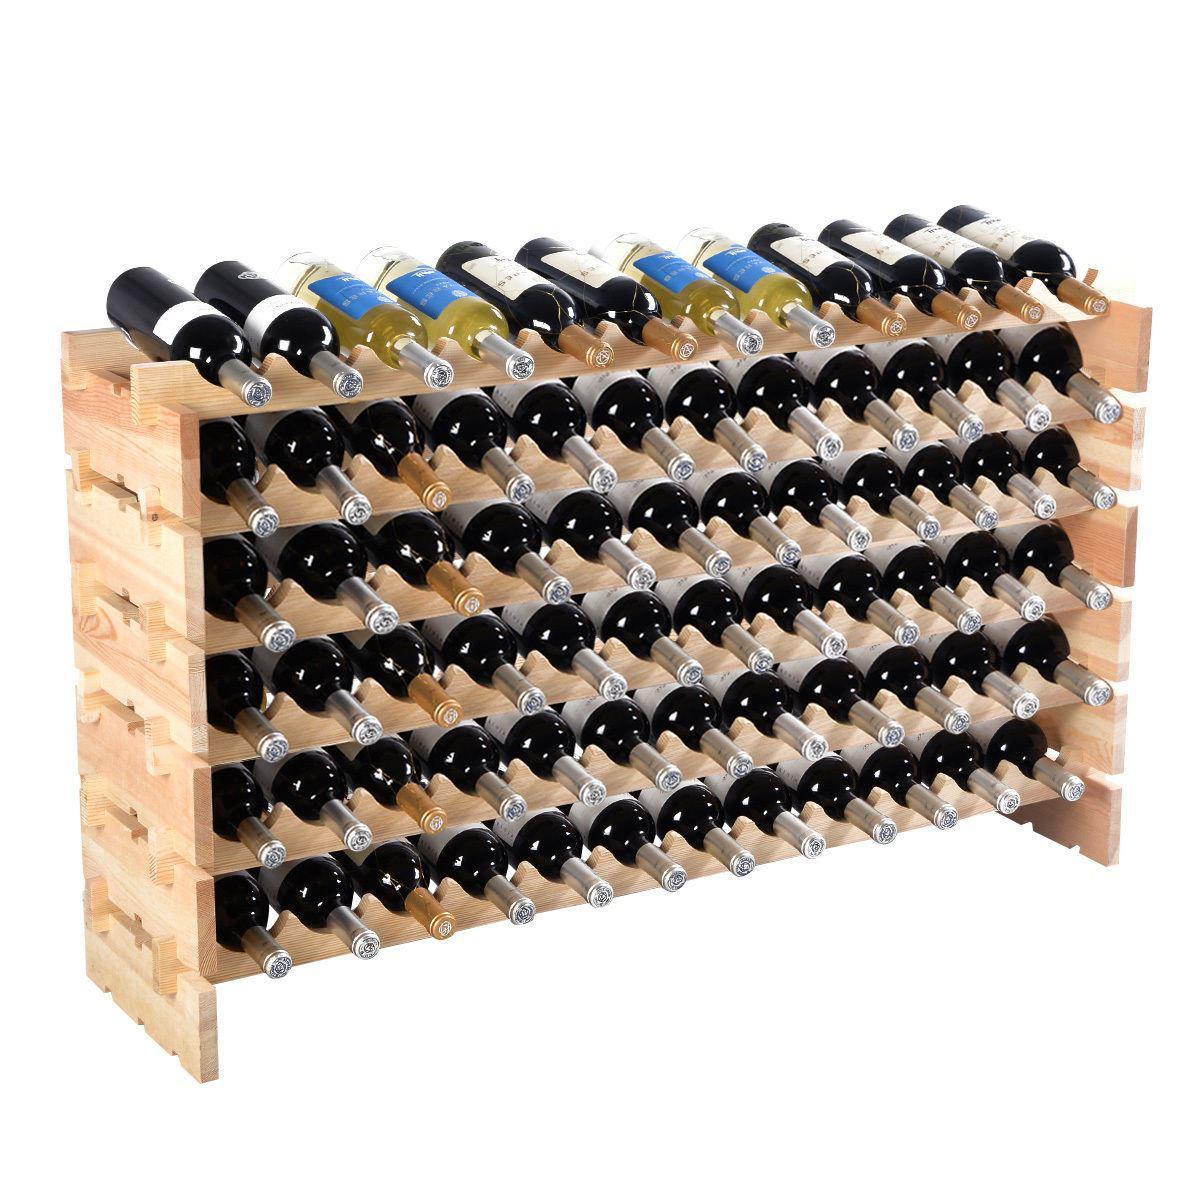 Picture of Wine Rack Holder Storage for 72 Bottles